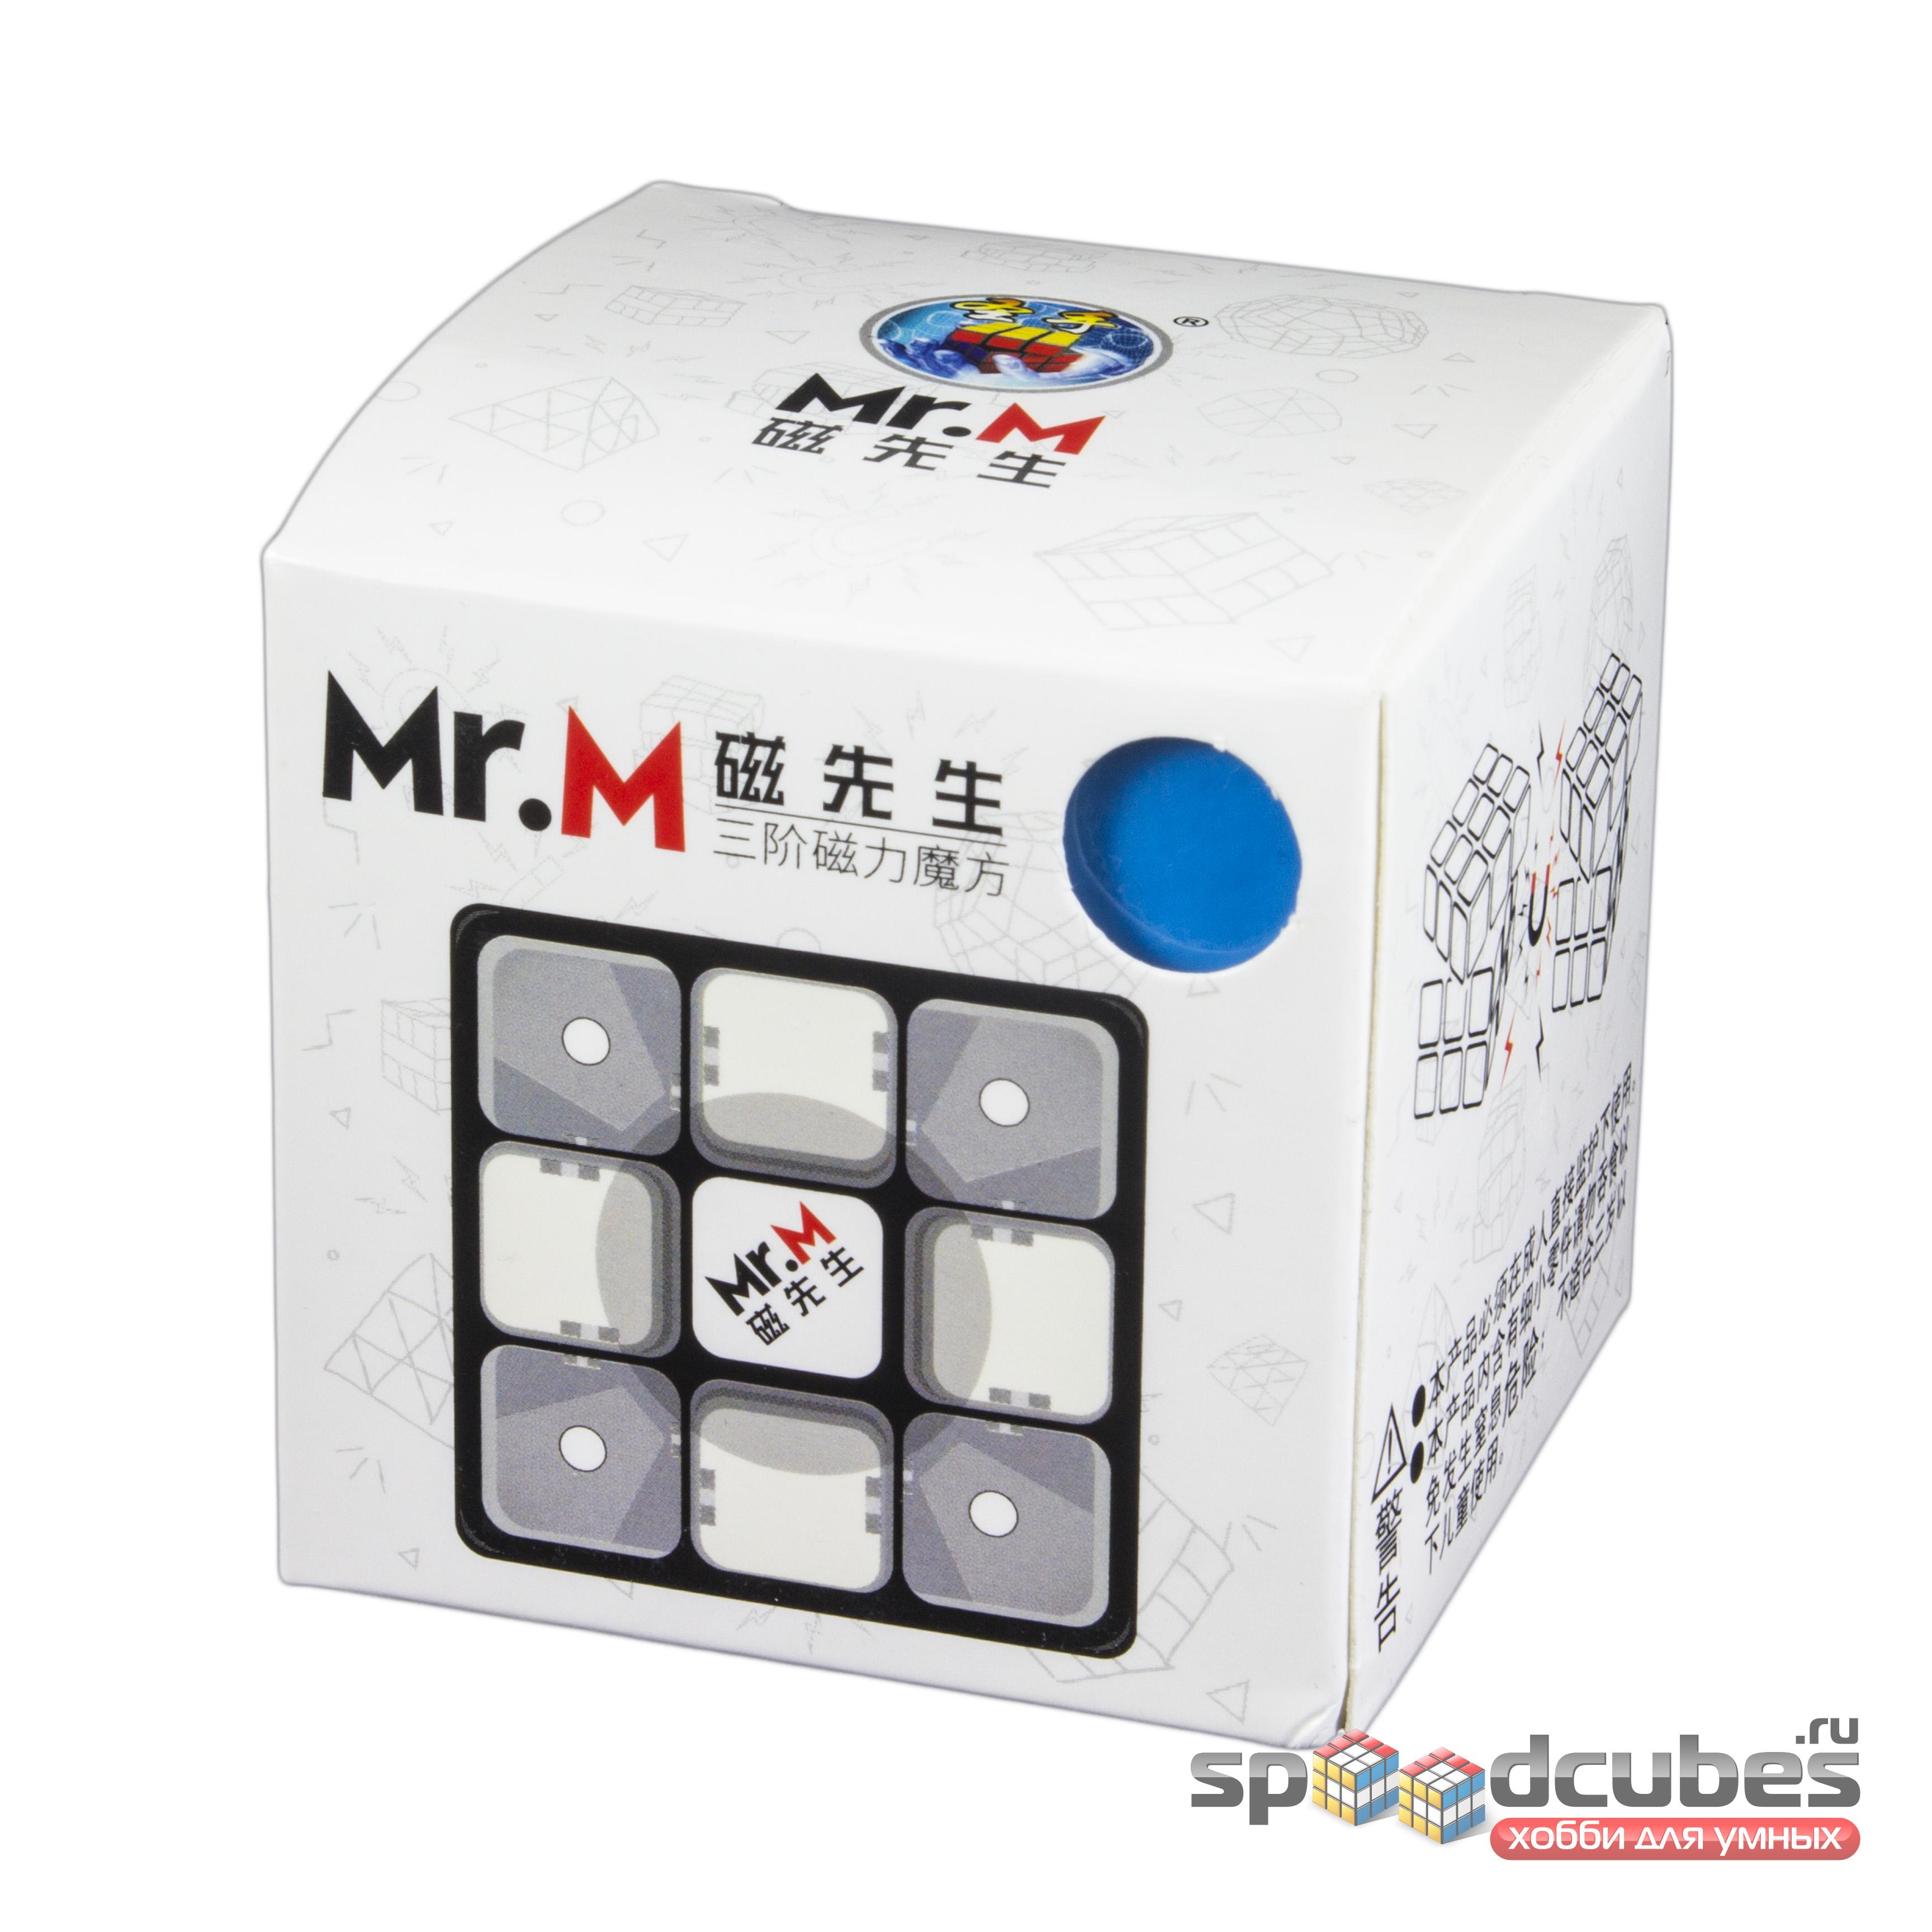 Shengshou 3x3x3 Mr M 1